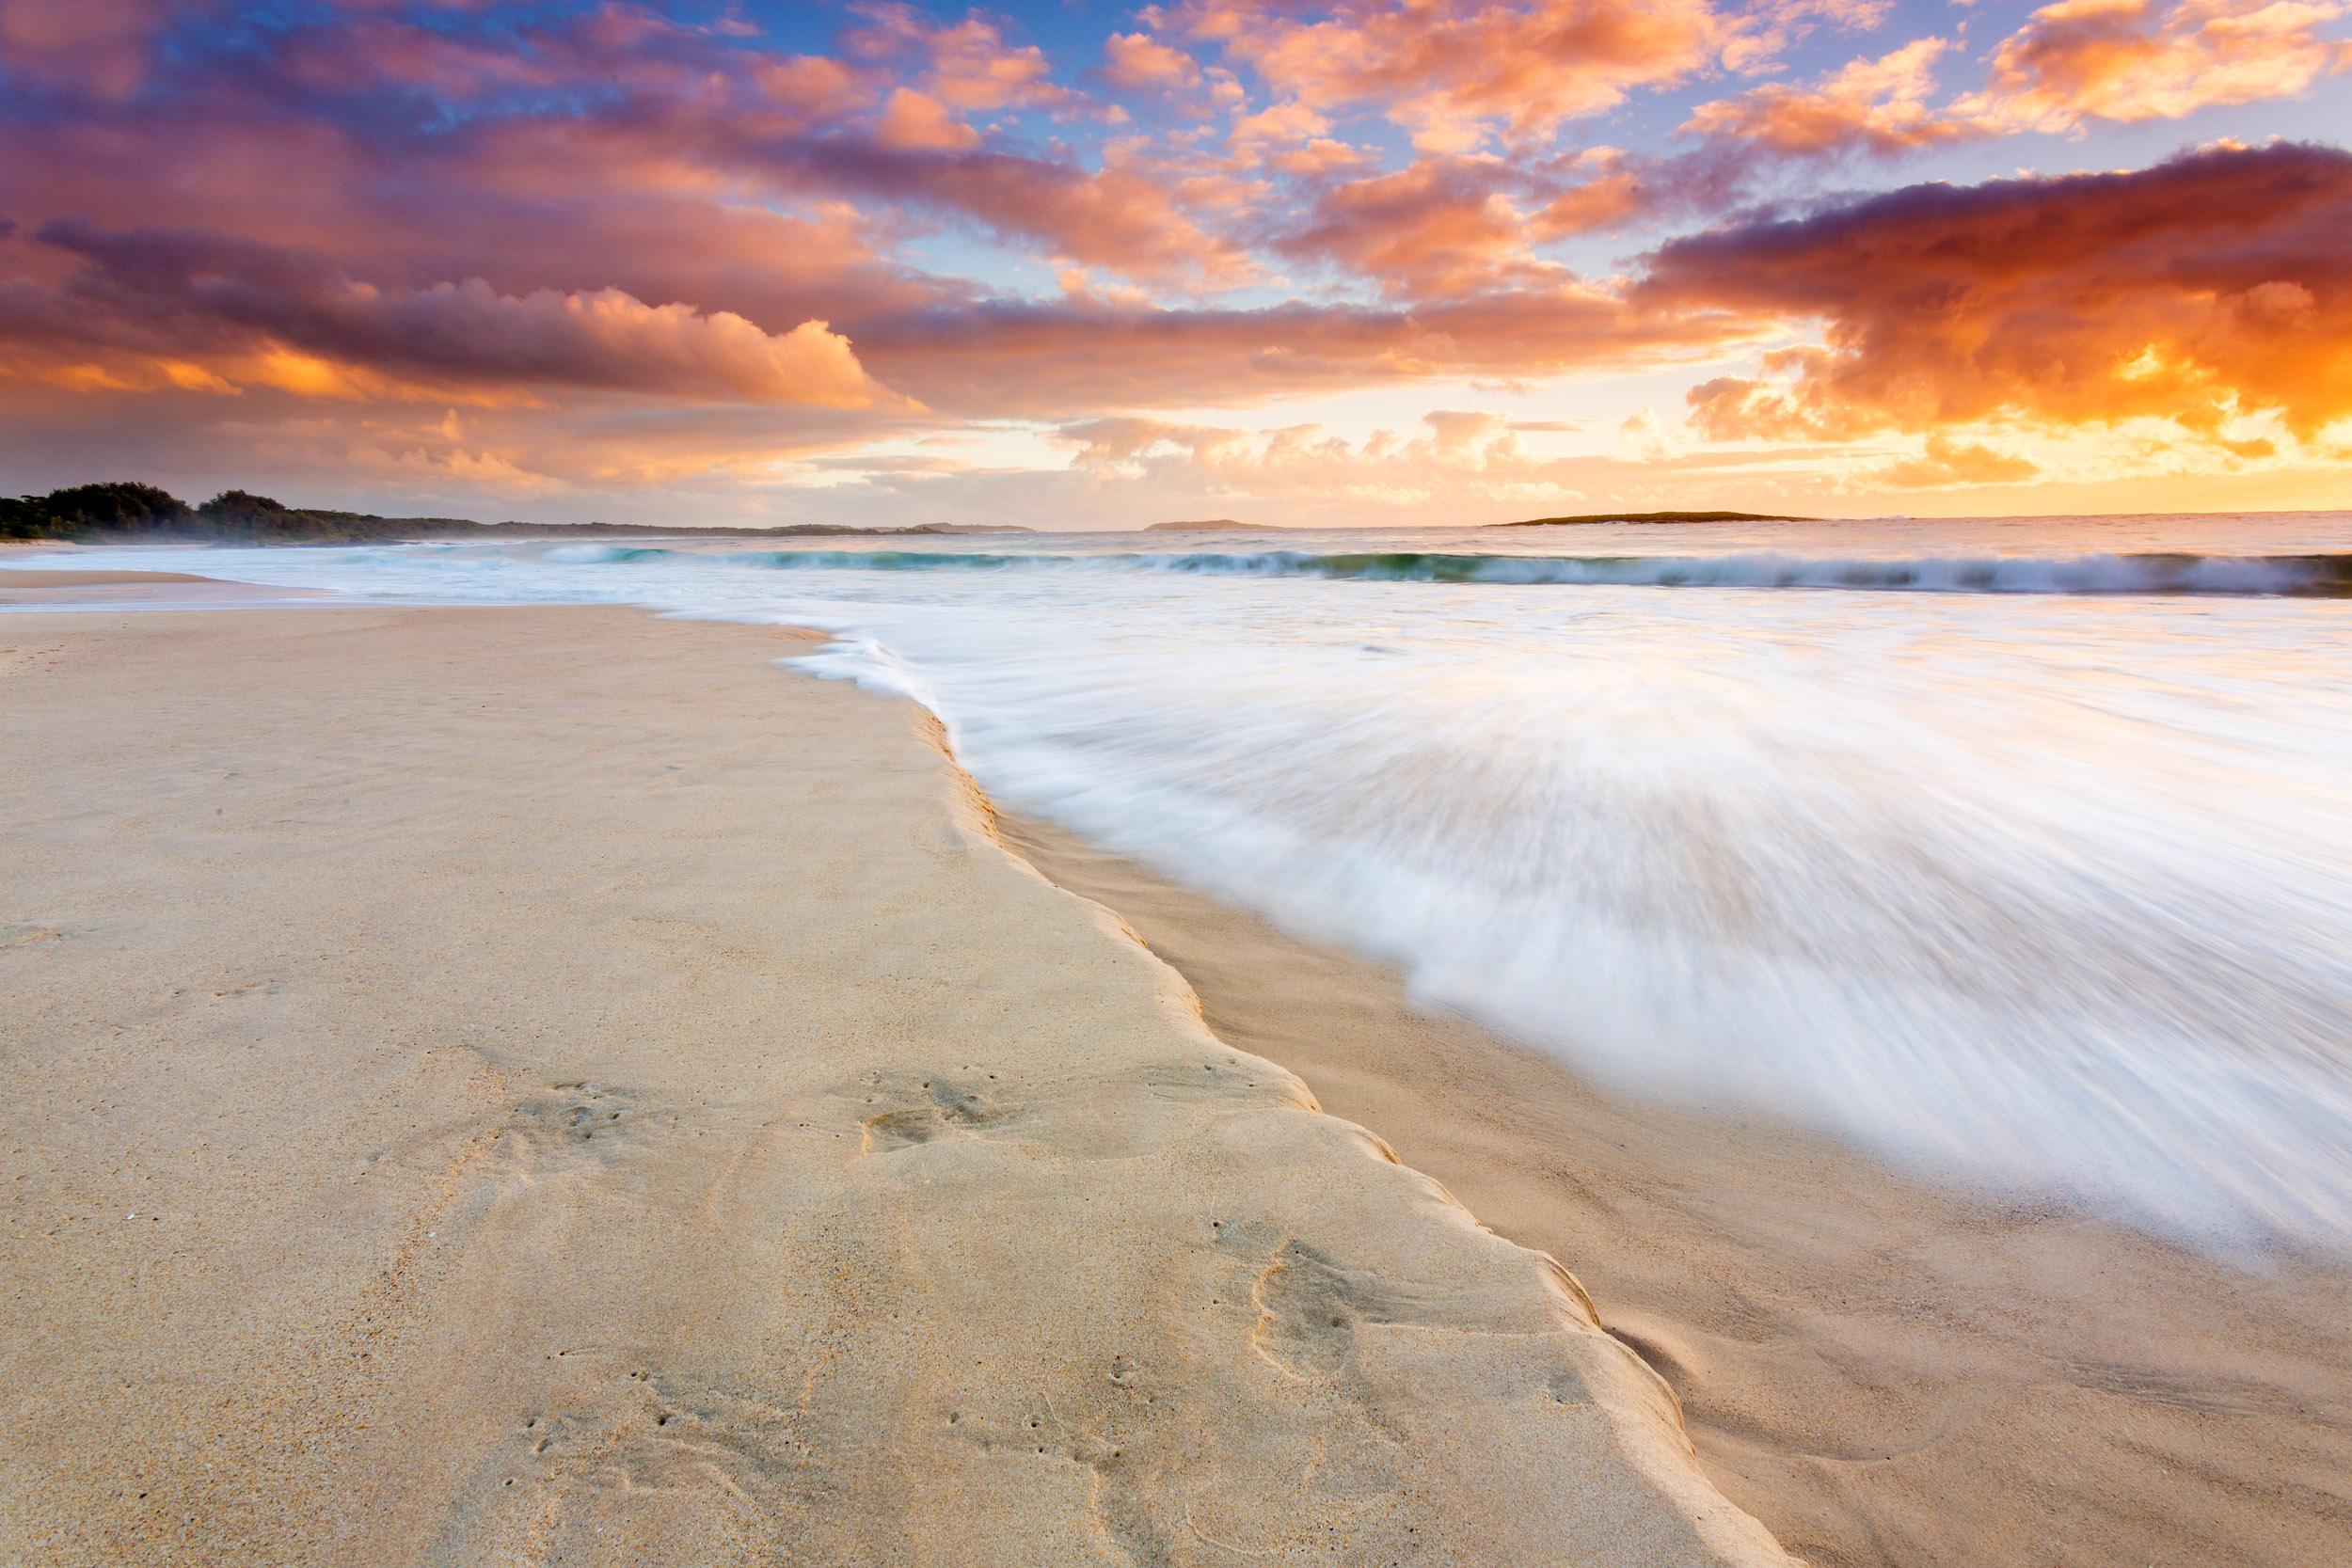 south-coast-nsw-sunrise-beach-coastline.jpg